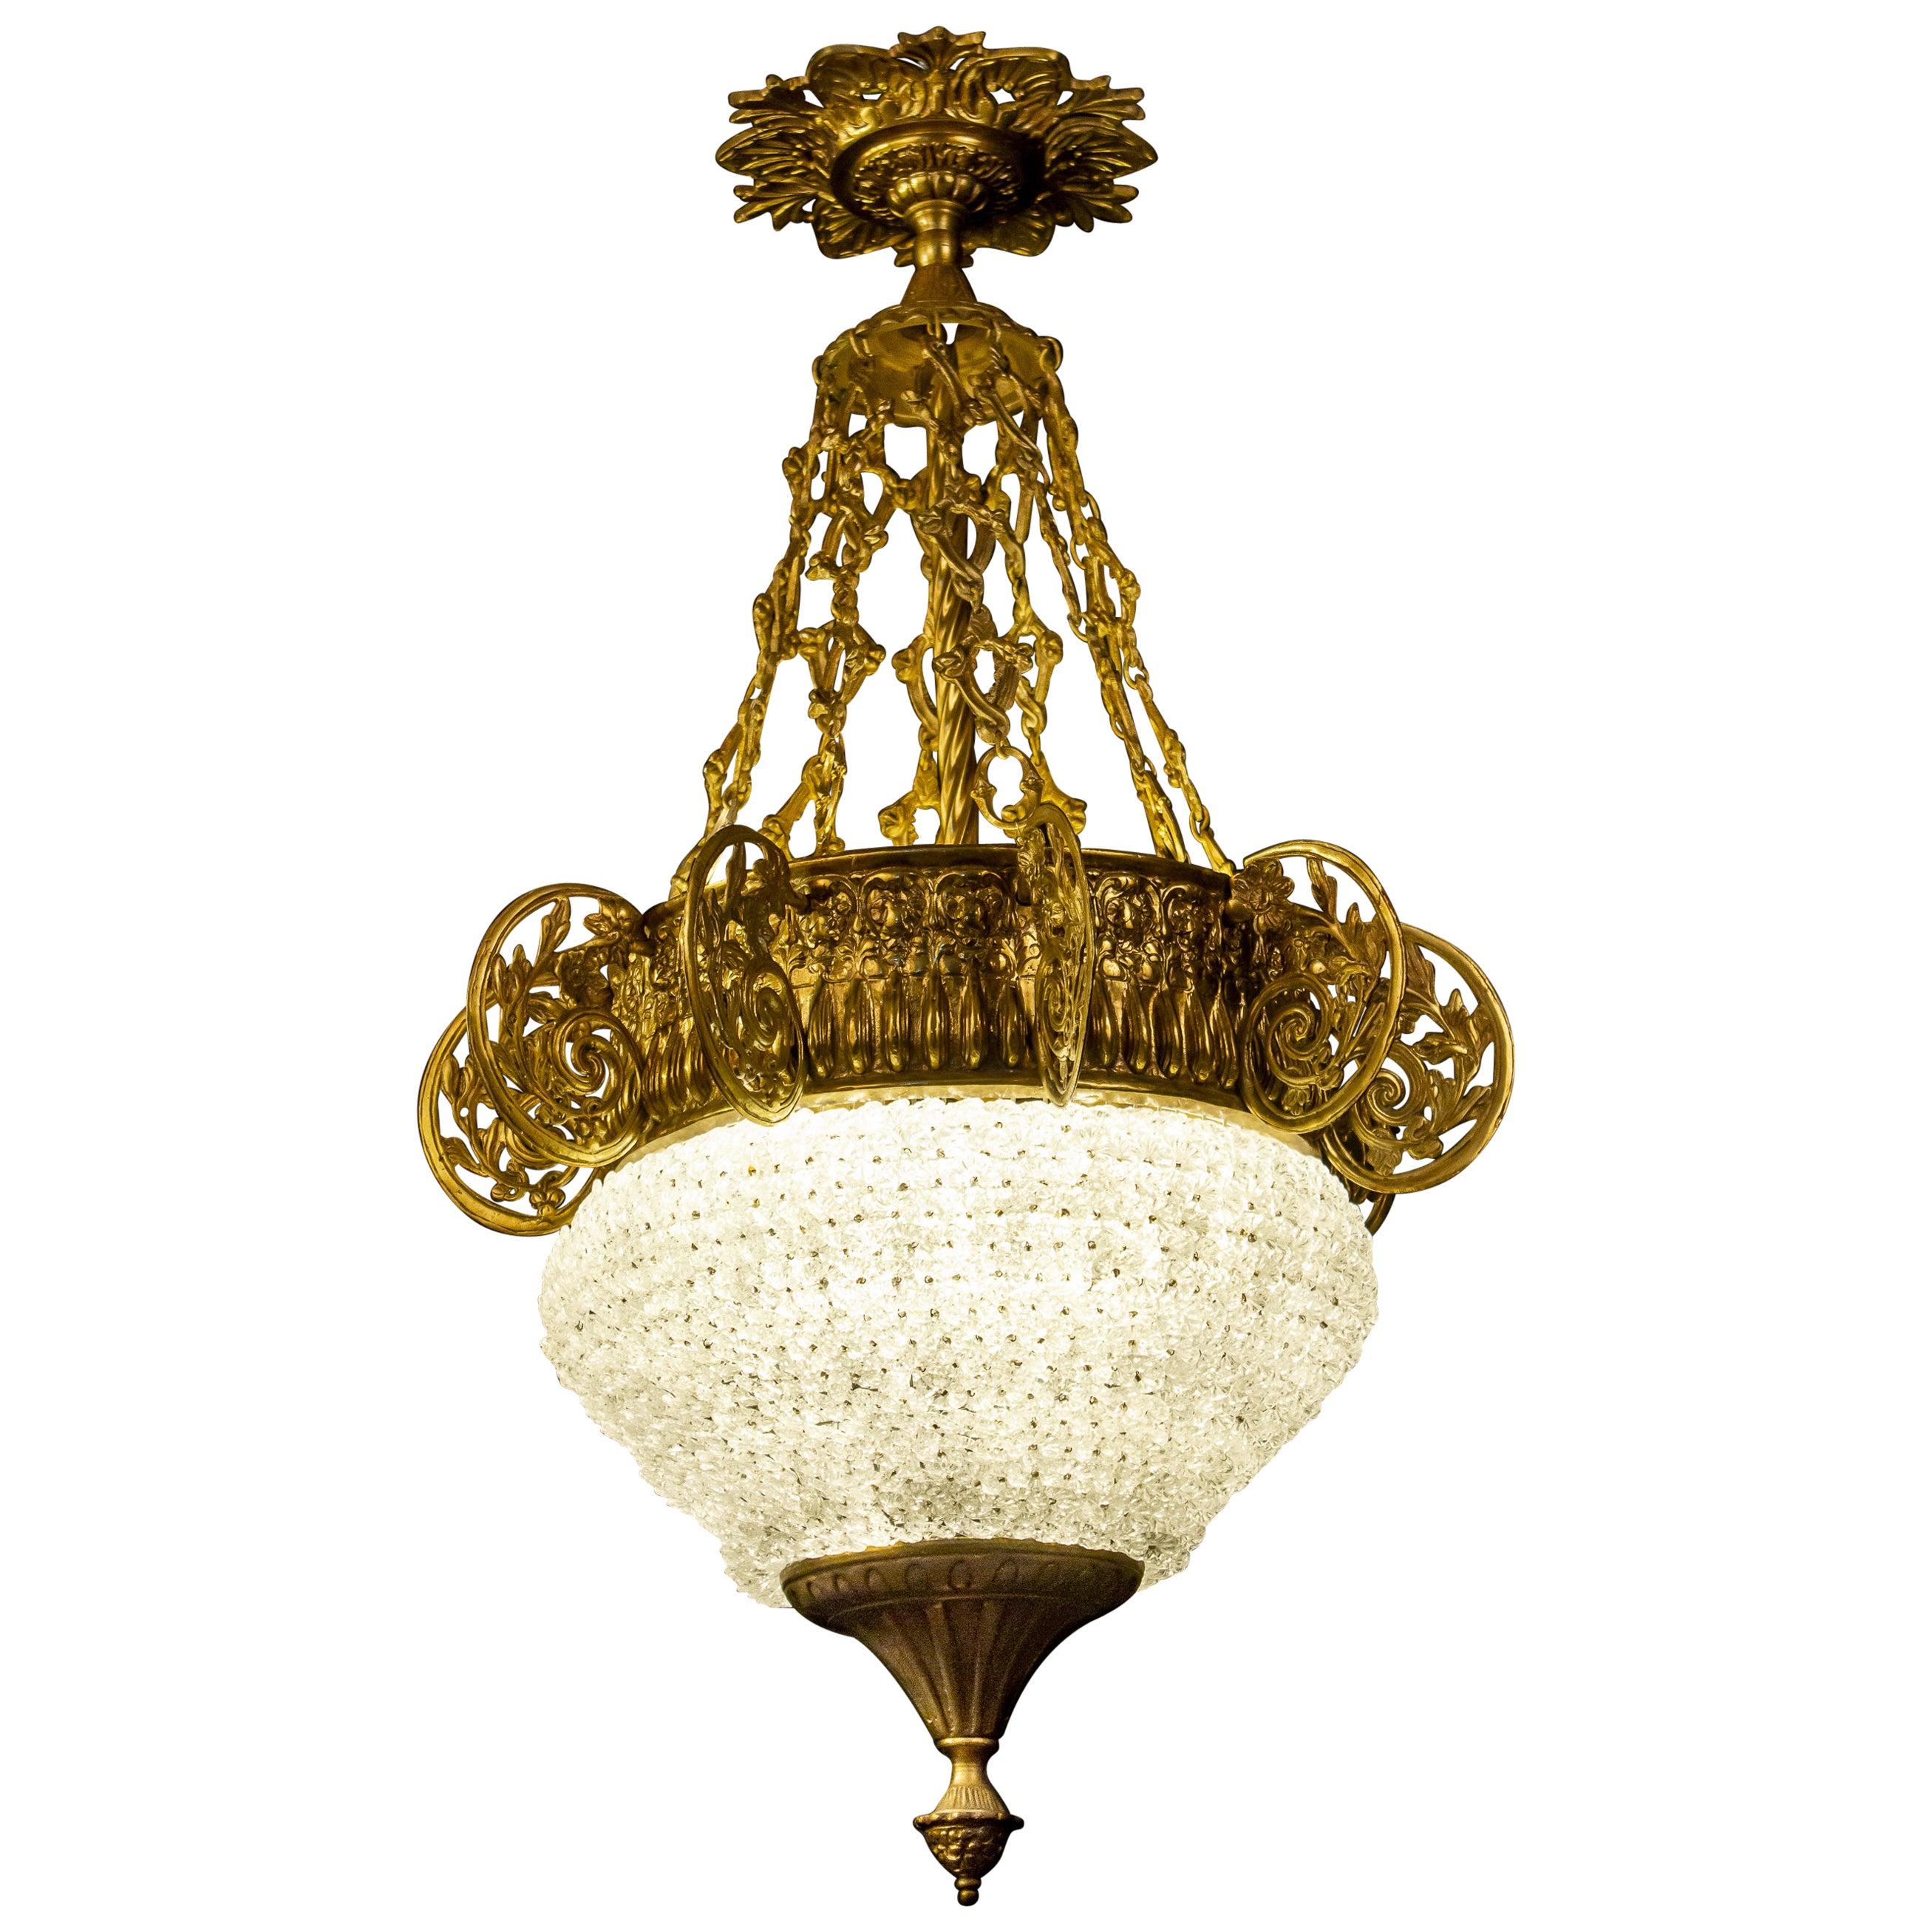 Art Deco Italian Ormolu and Murano Glass Majestic Lantern Chandelier, 1930